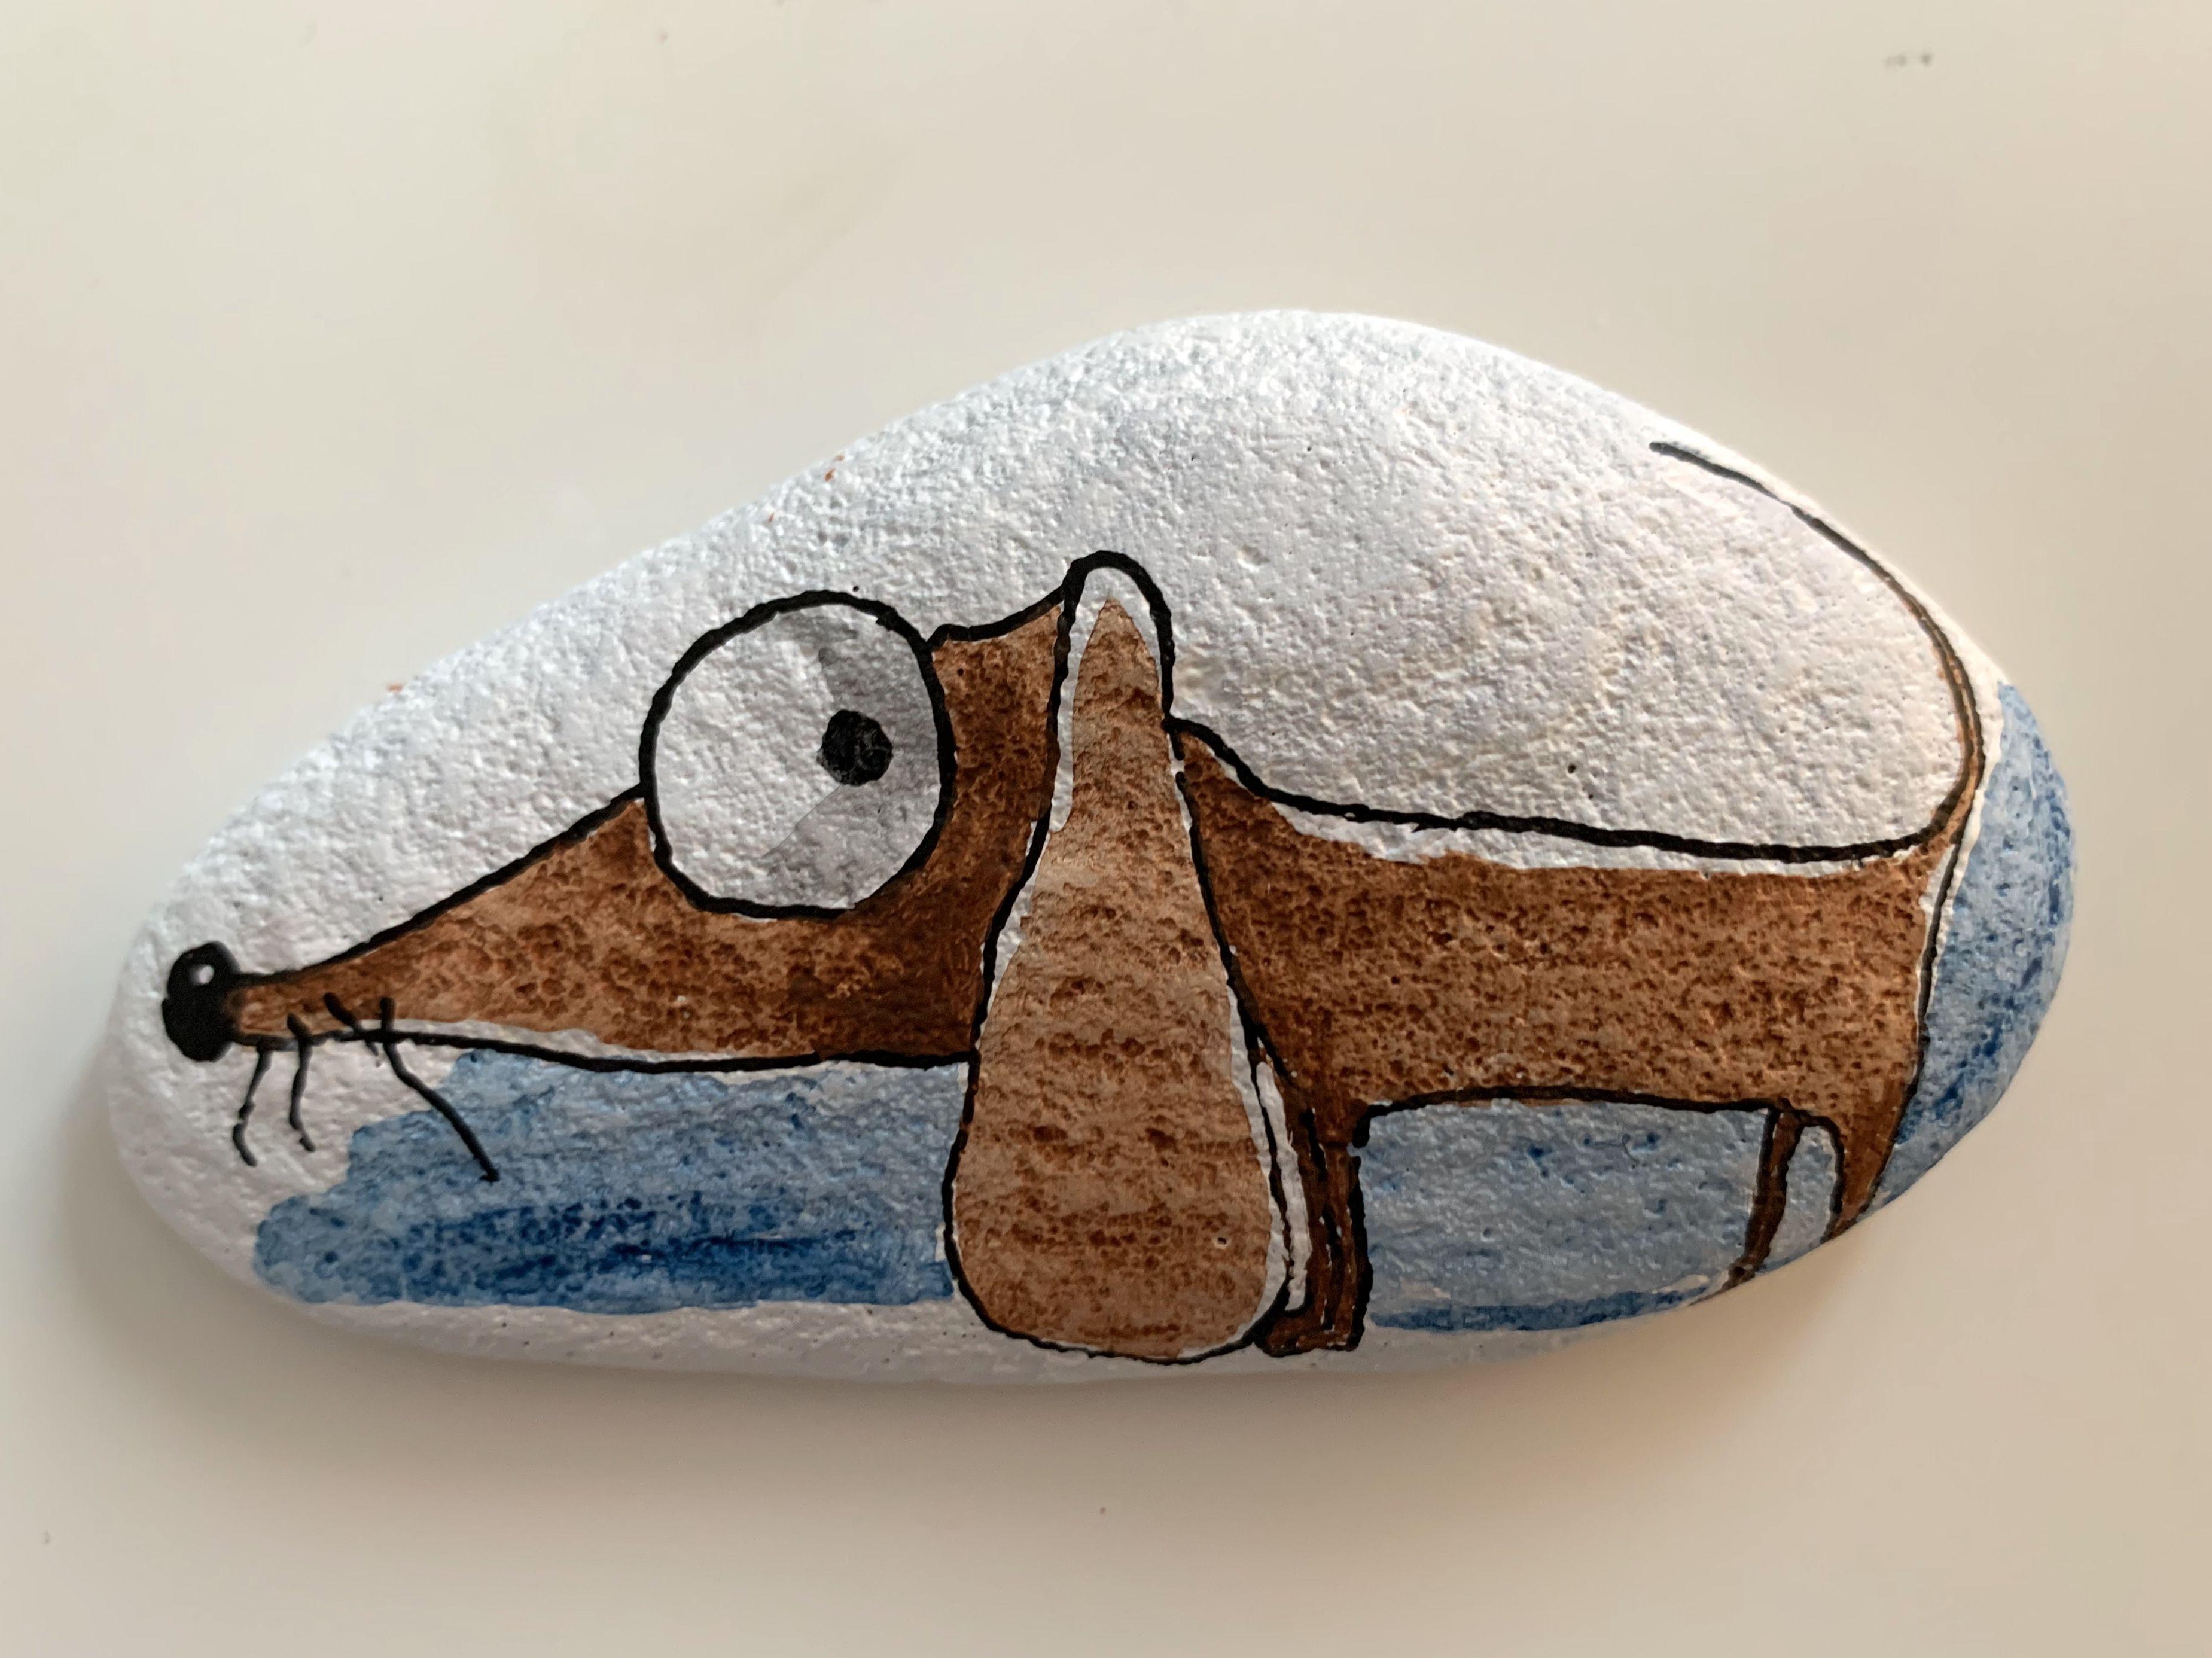 Steinmalerei - Rockart - Dackel